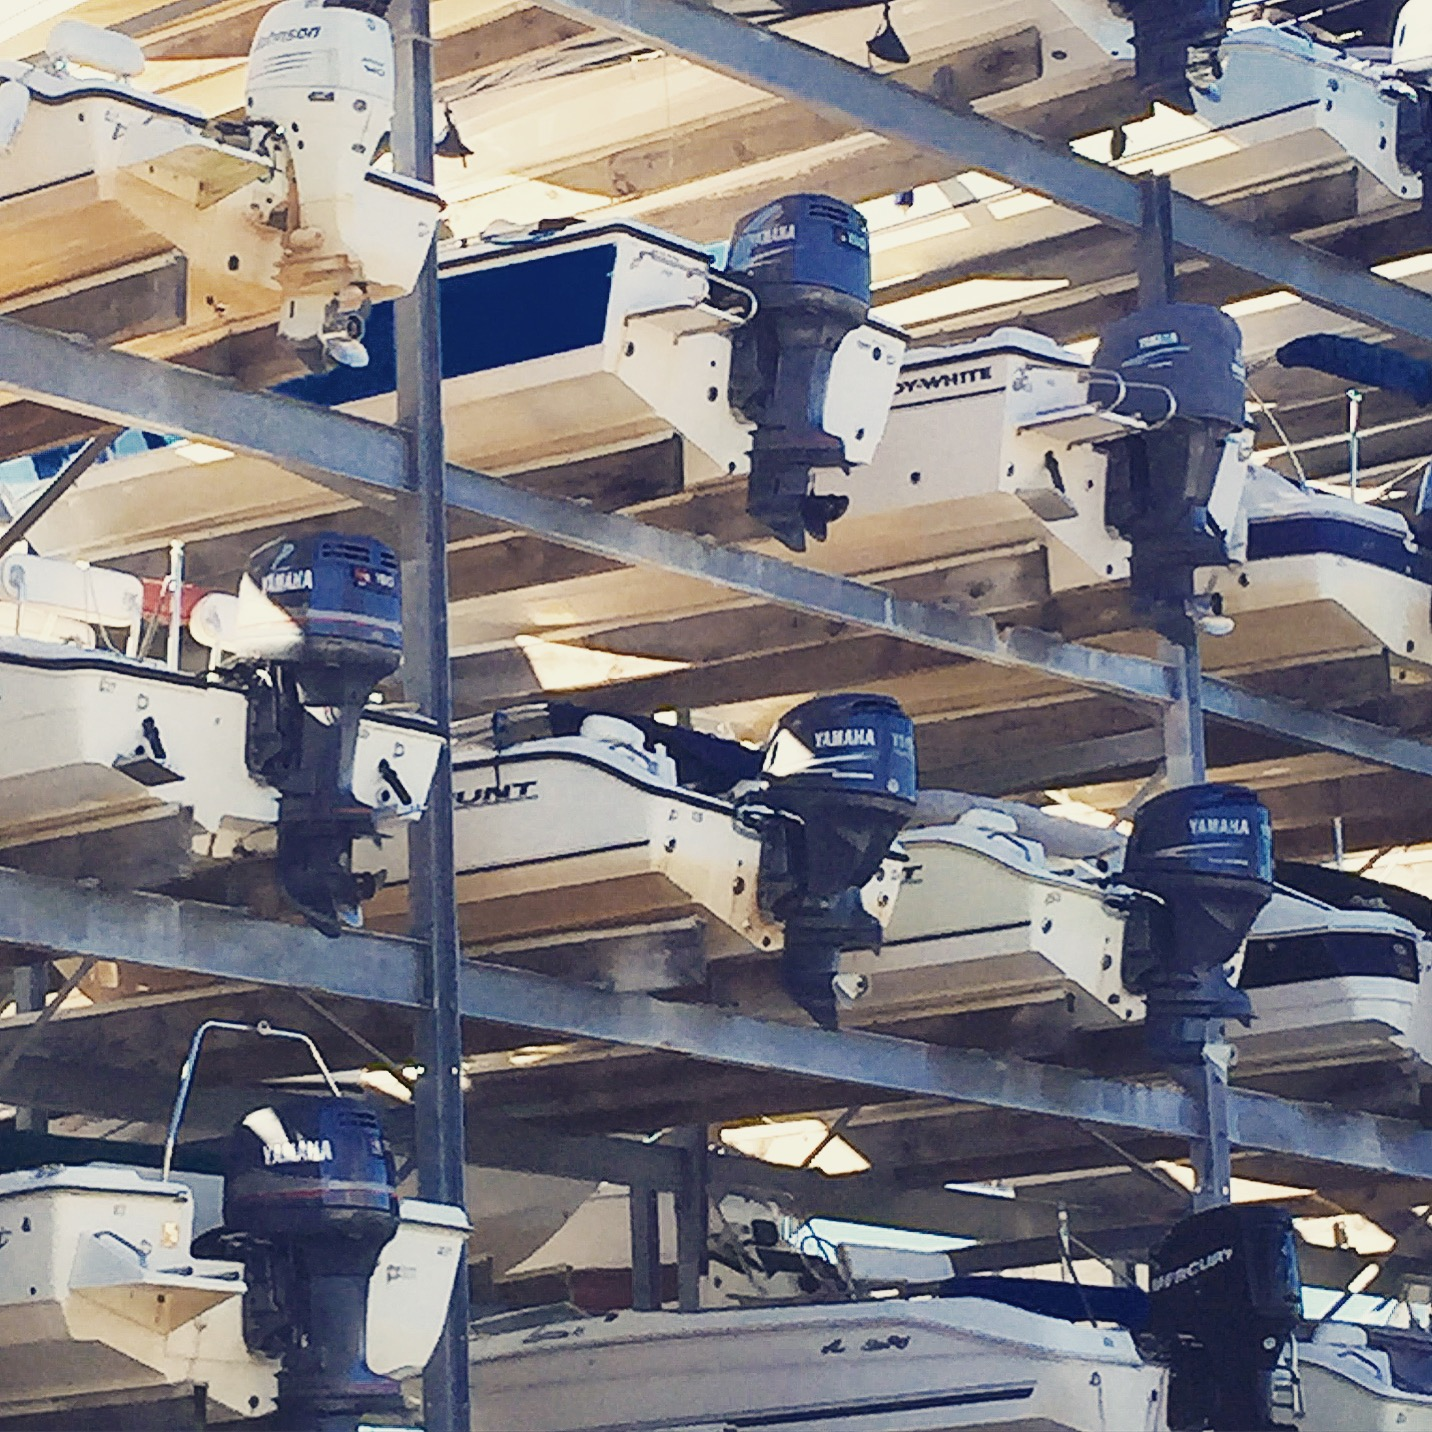 Parking lot for boats - Shem Creek, Charleston SC